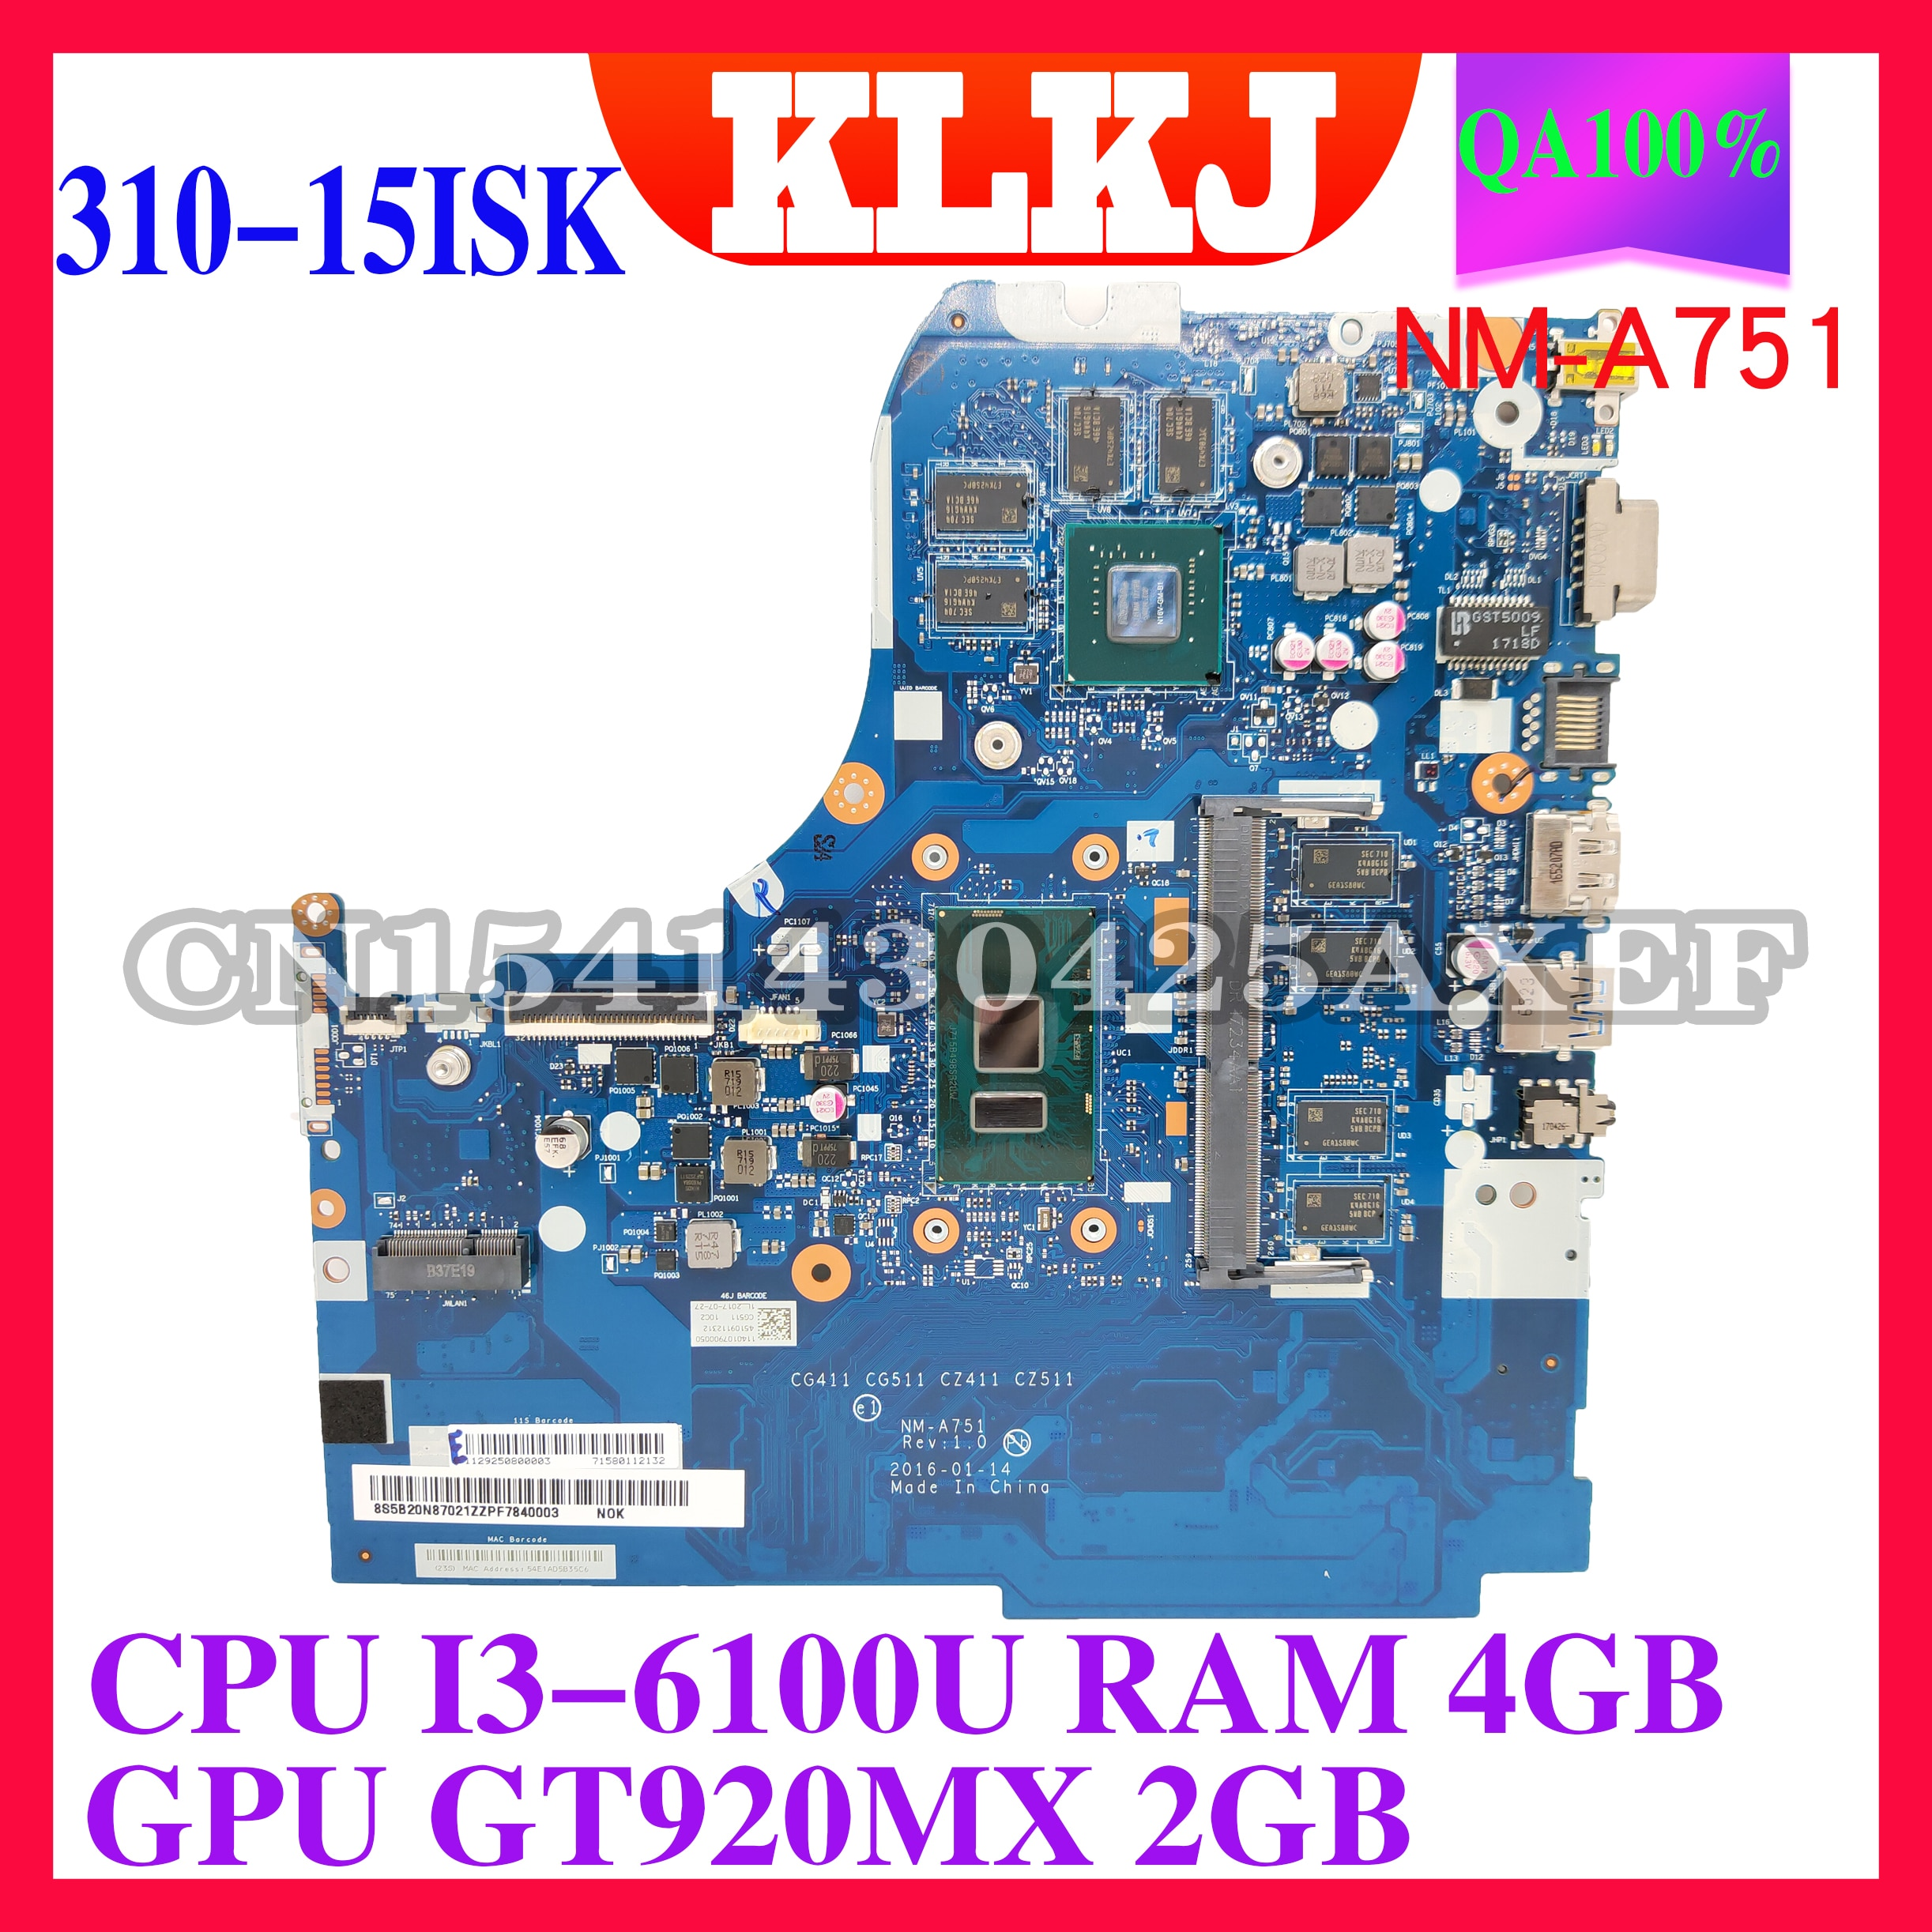 KLKJ NM-A751 اللوحة الأم لأجهزة الكمبيوتر المحمول لينوفو 310-15ISK 310-15IKB اللوحة الرئيسية الأصلية 4GB-RAM I3-6100U GT920MX-2GB